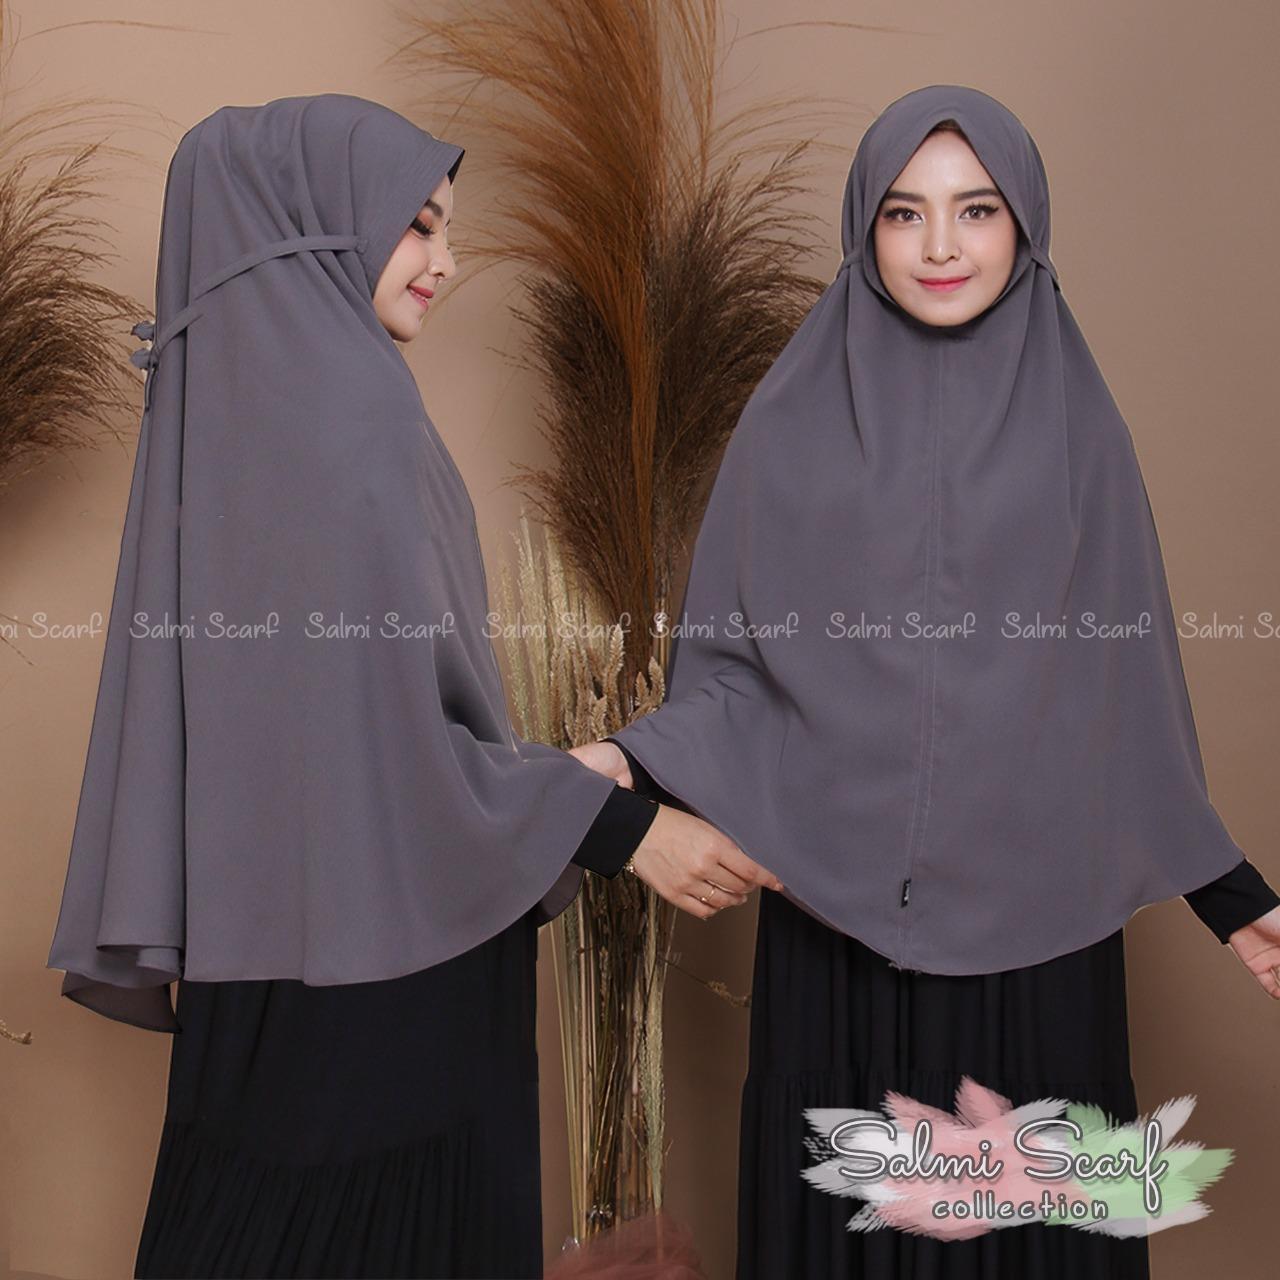 Salmi Scraf - Khimar Tali XL / Hijab Instan / Hijab Syar'i terbaru / Jilbab Syar'i / Fashion Wanita Murah / Kerudung Wanita